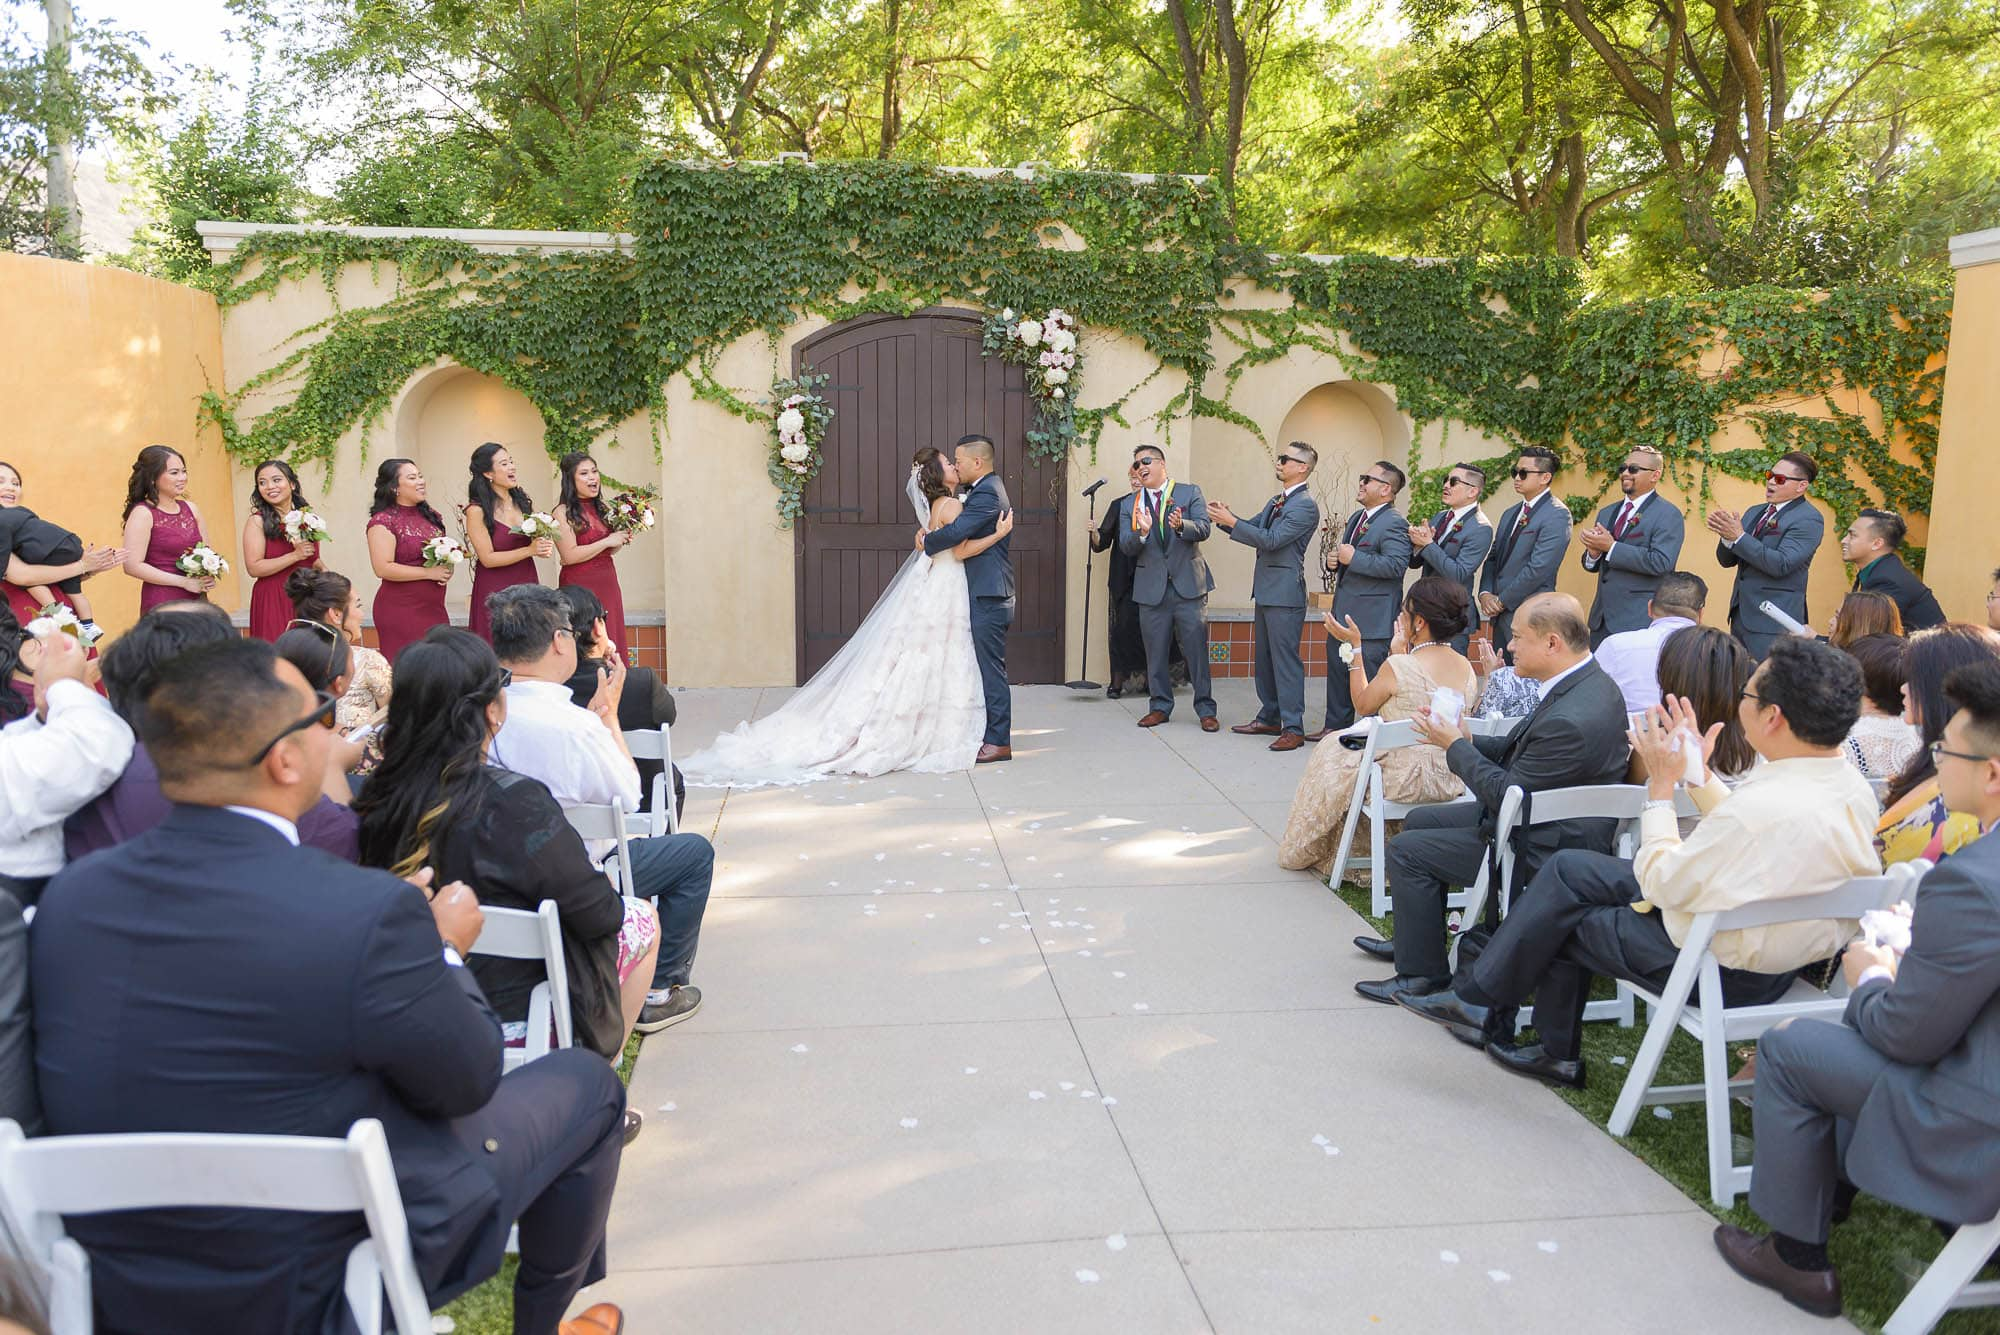 022_Alan_and_Heidi_Wedding_Karla_Paolo